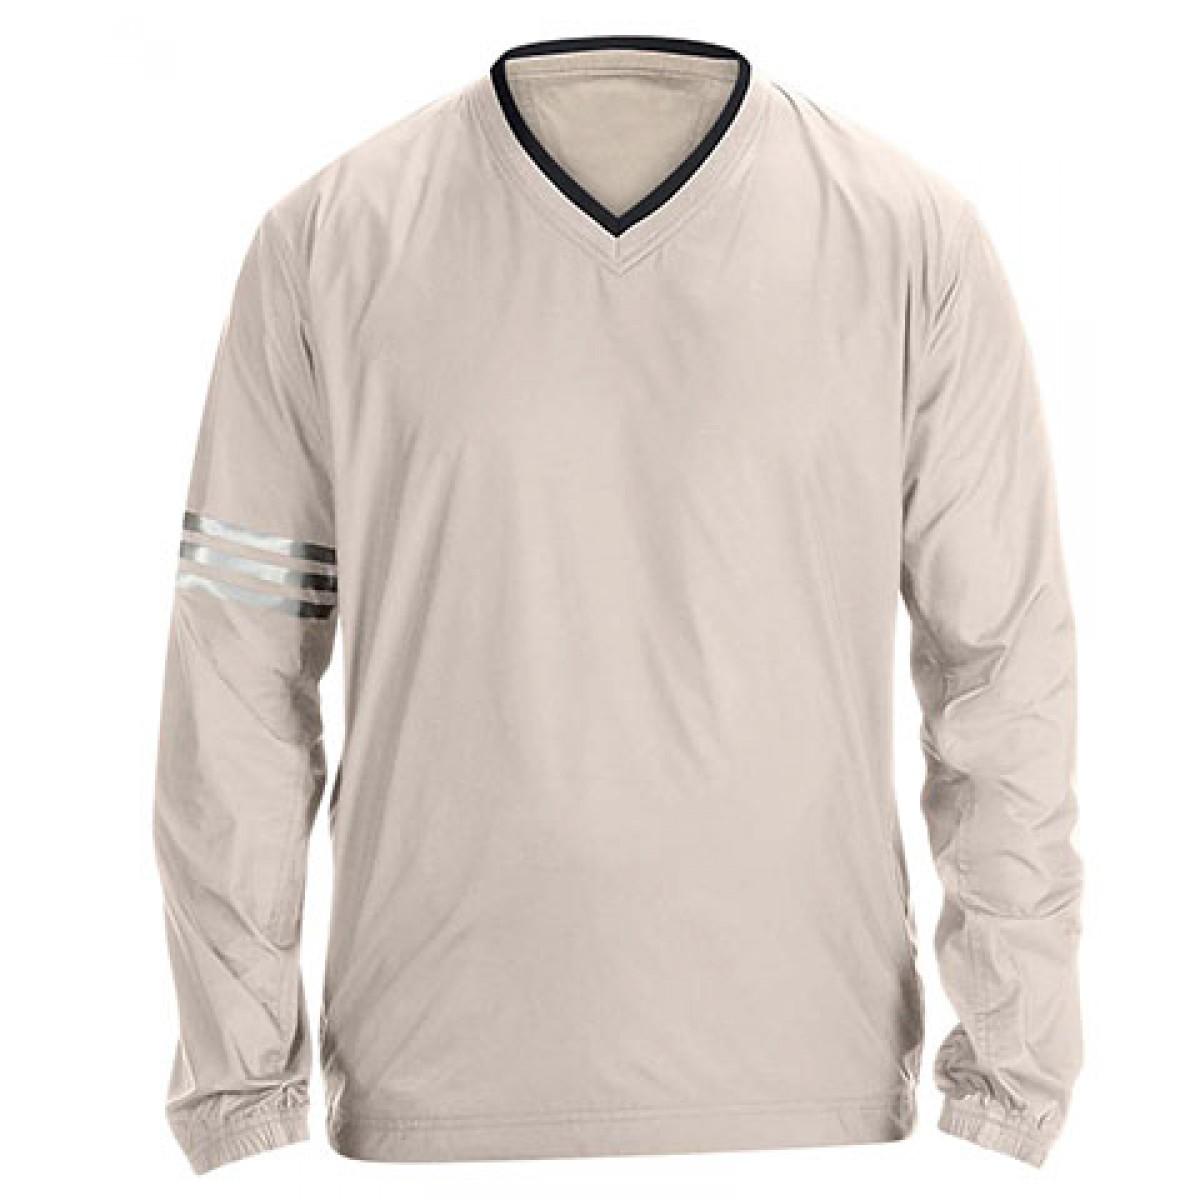 Adidas ClimaLite V-Neck Long Sleeve Wind Shirt-Brown-2XL